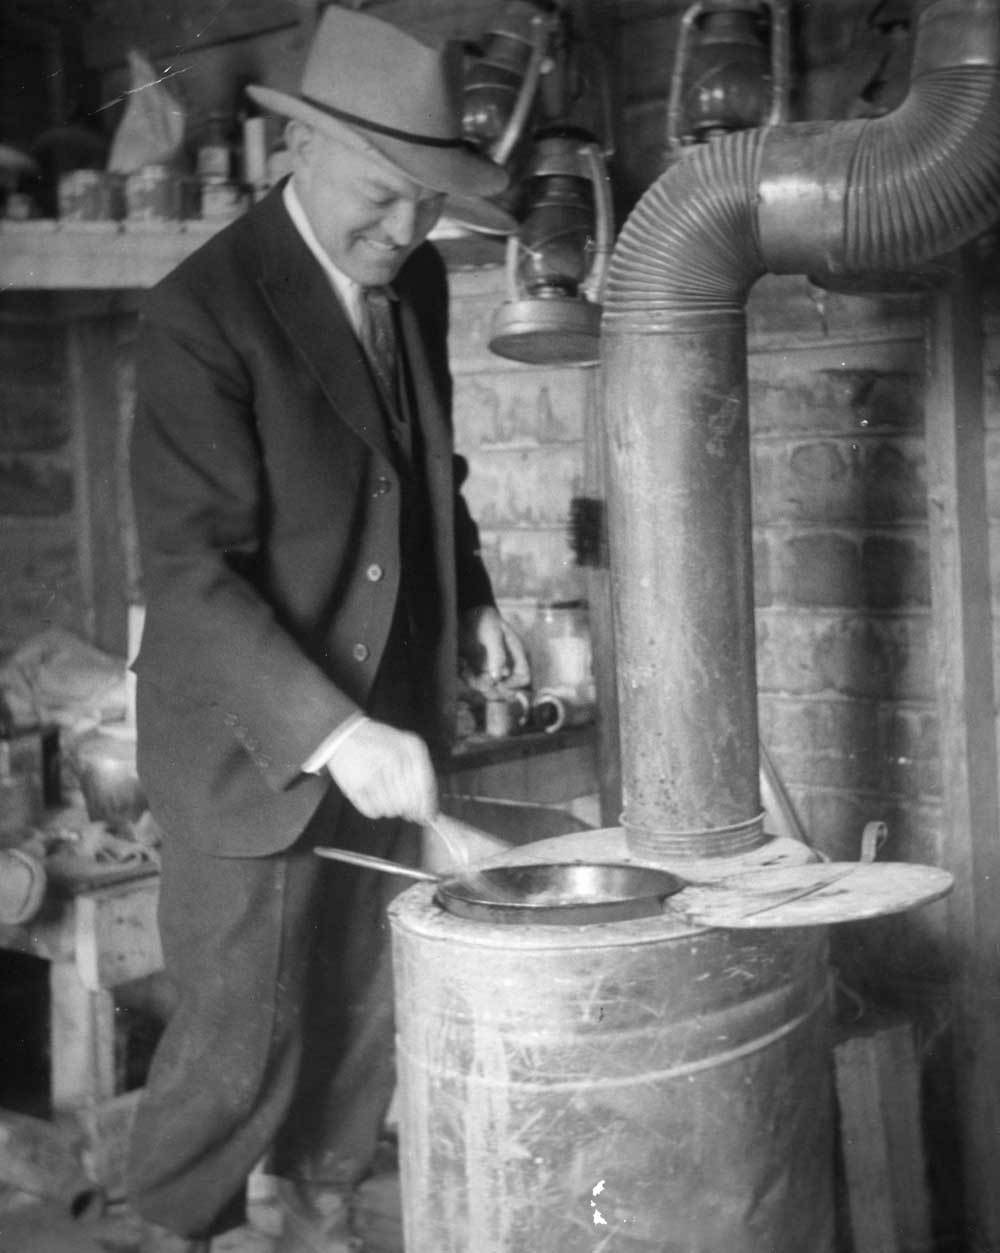 Harry Hines Woodring